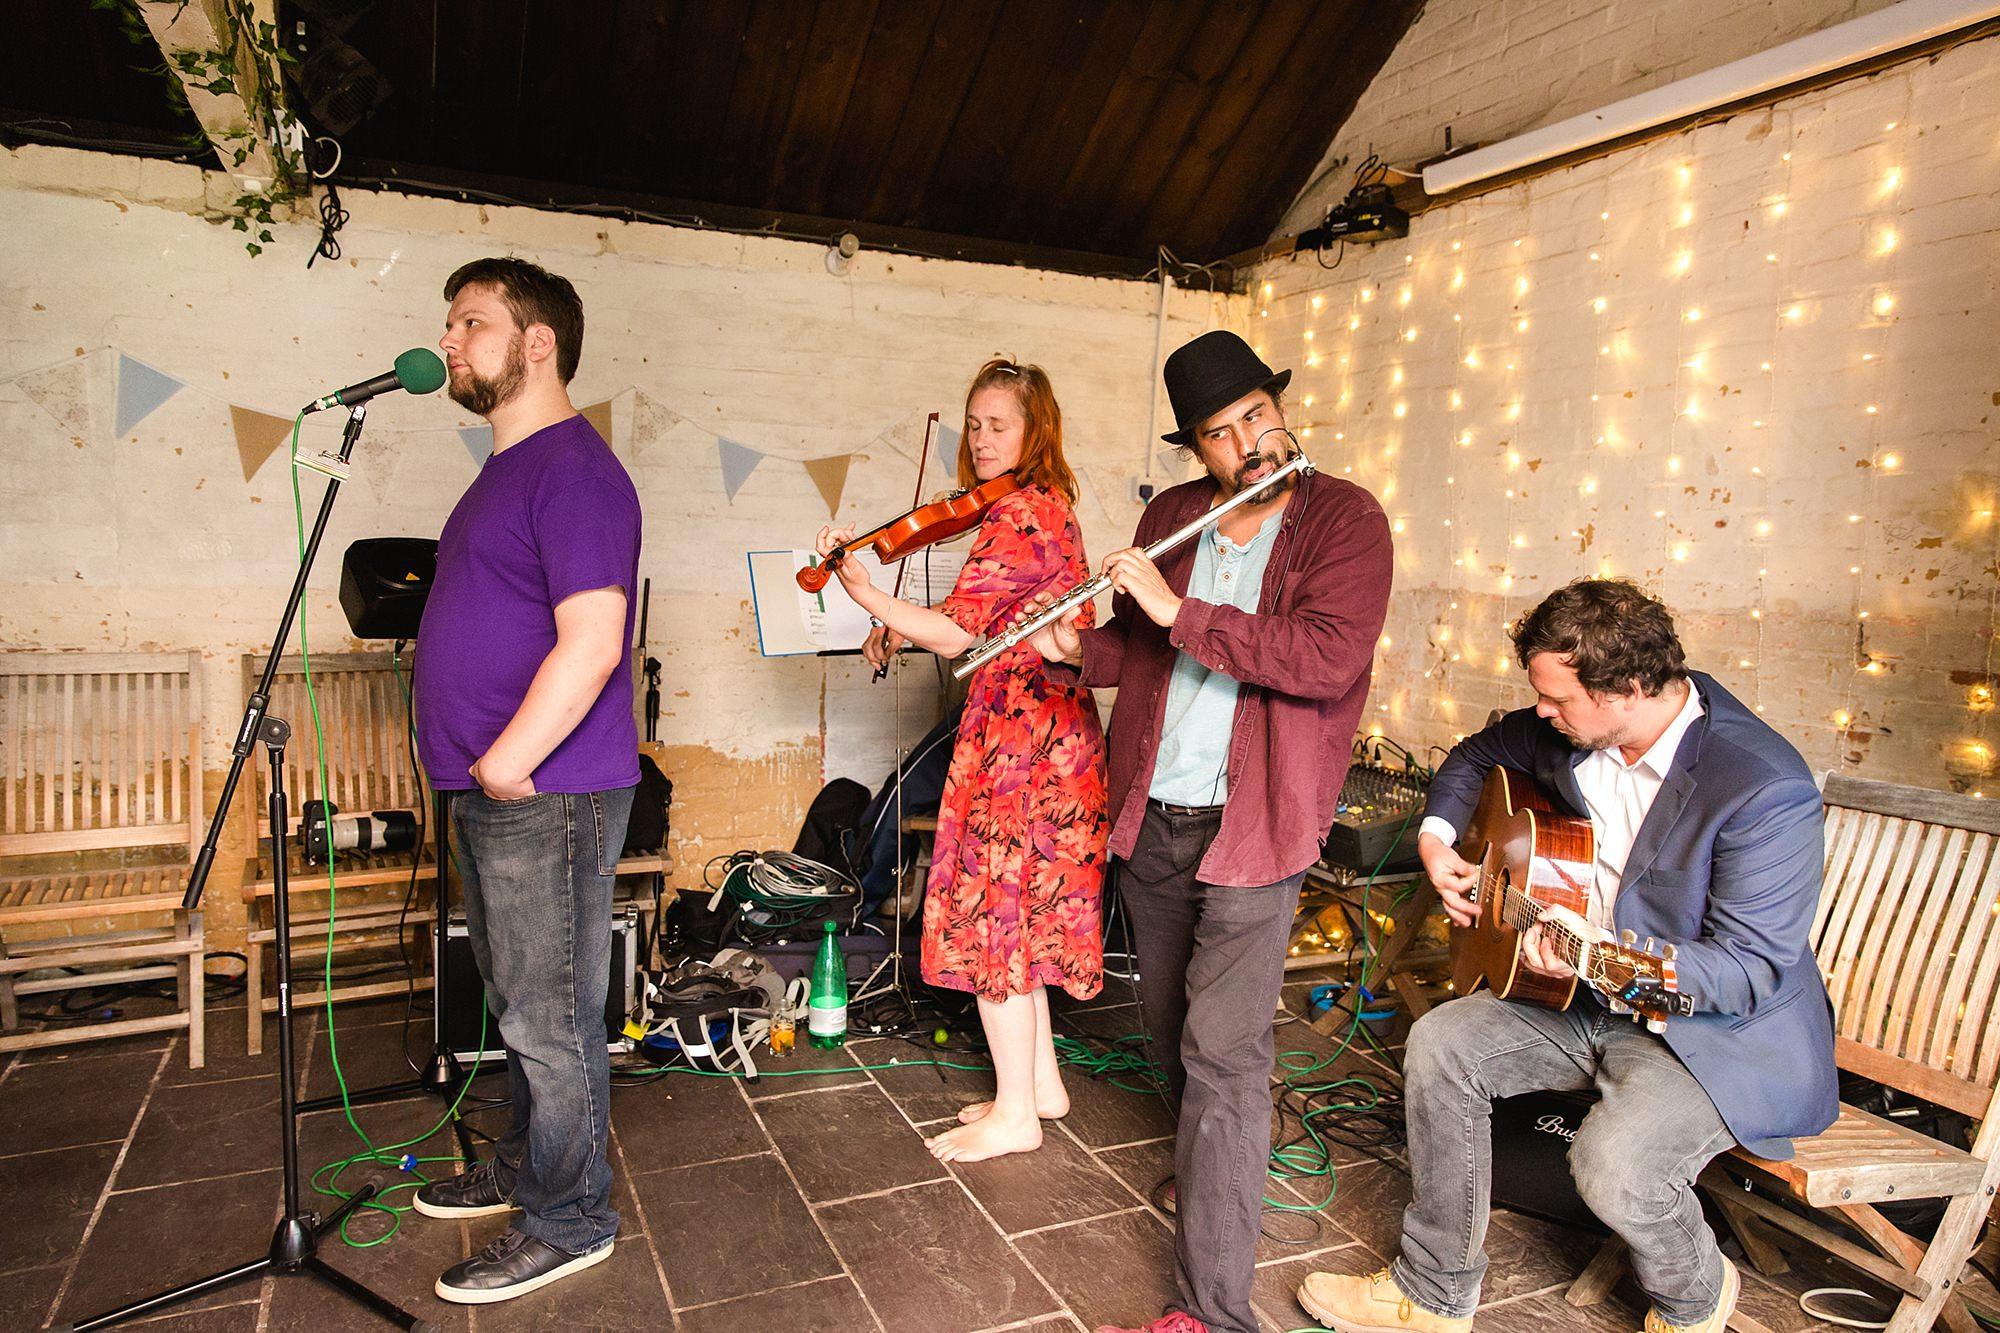 Isis Farmhouse Oxford Wedding ceilidh band playing